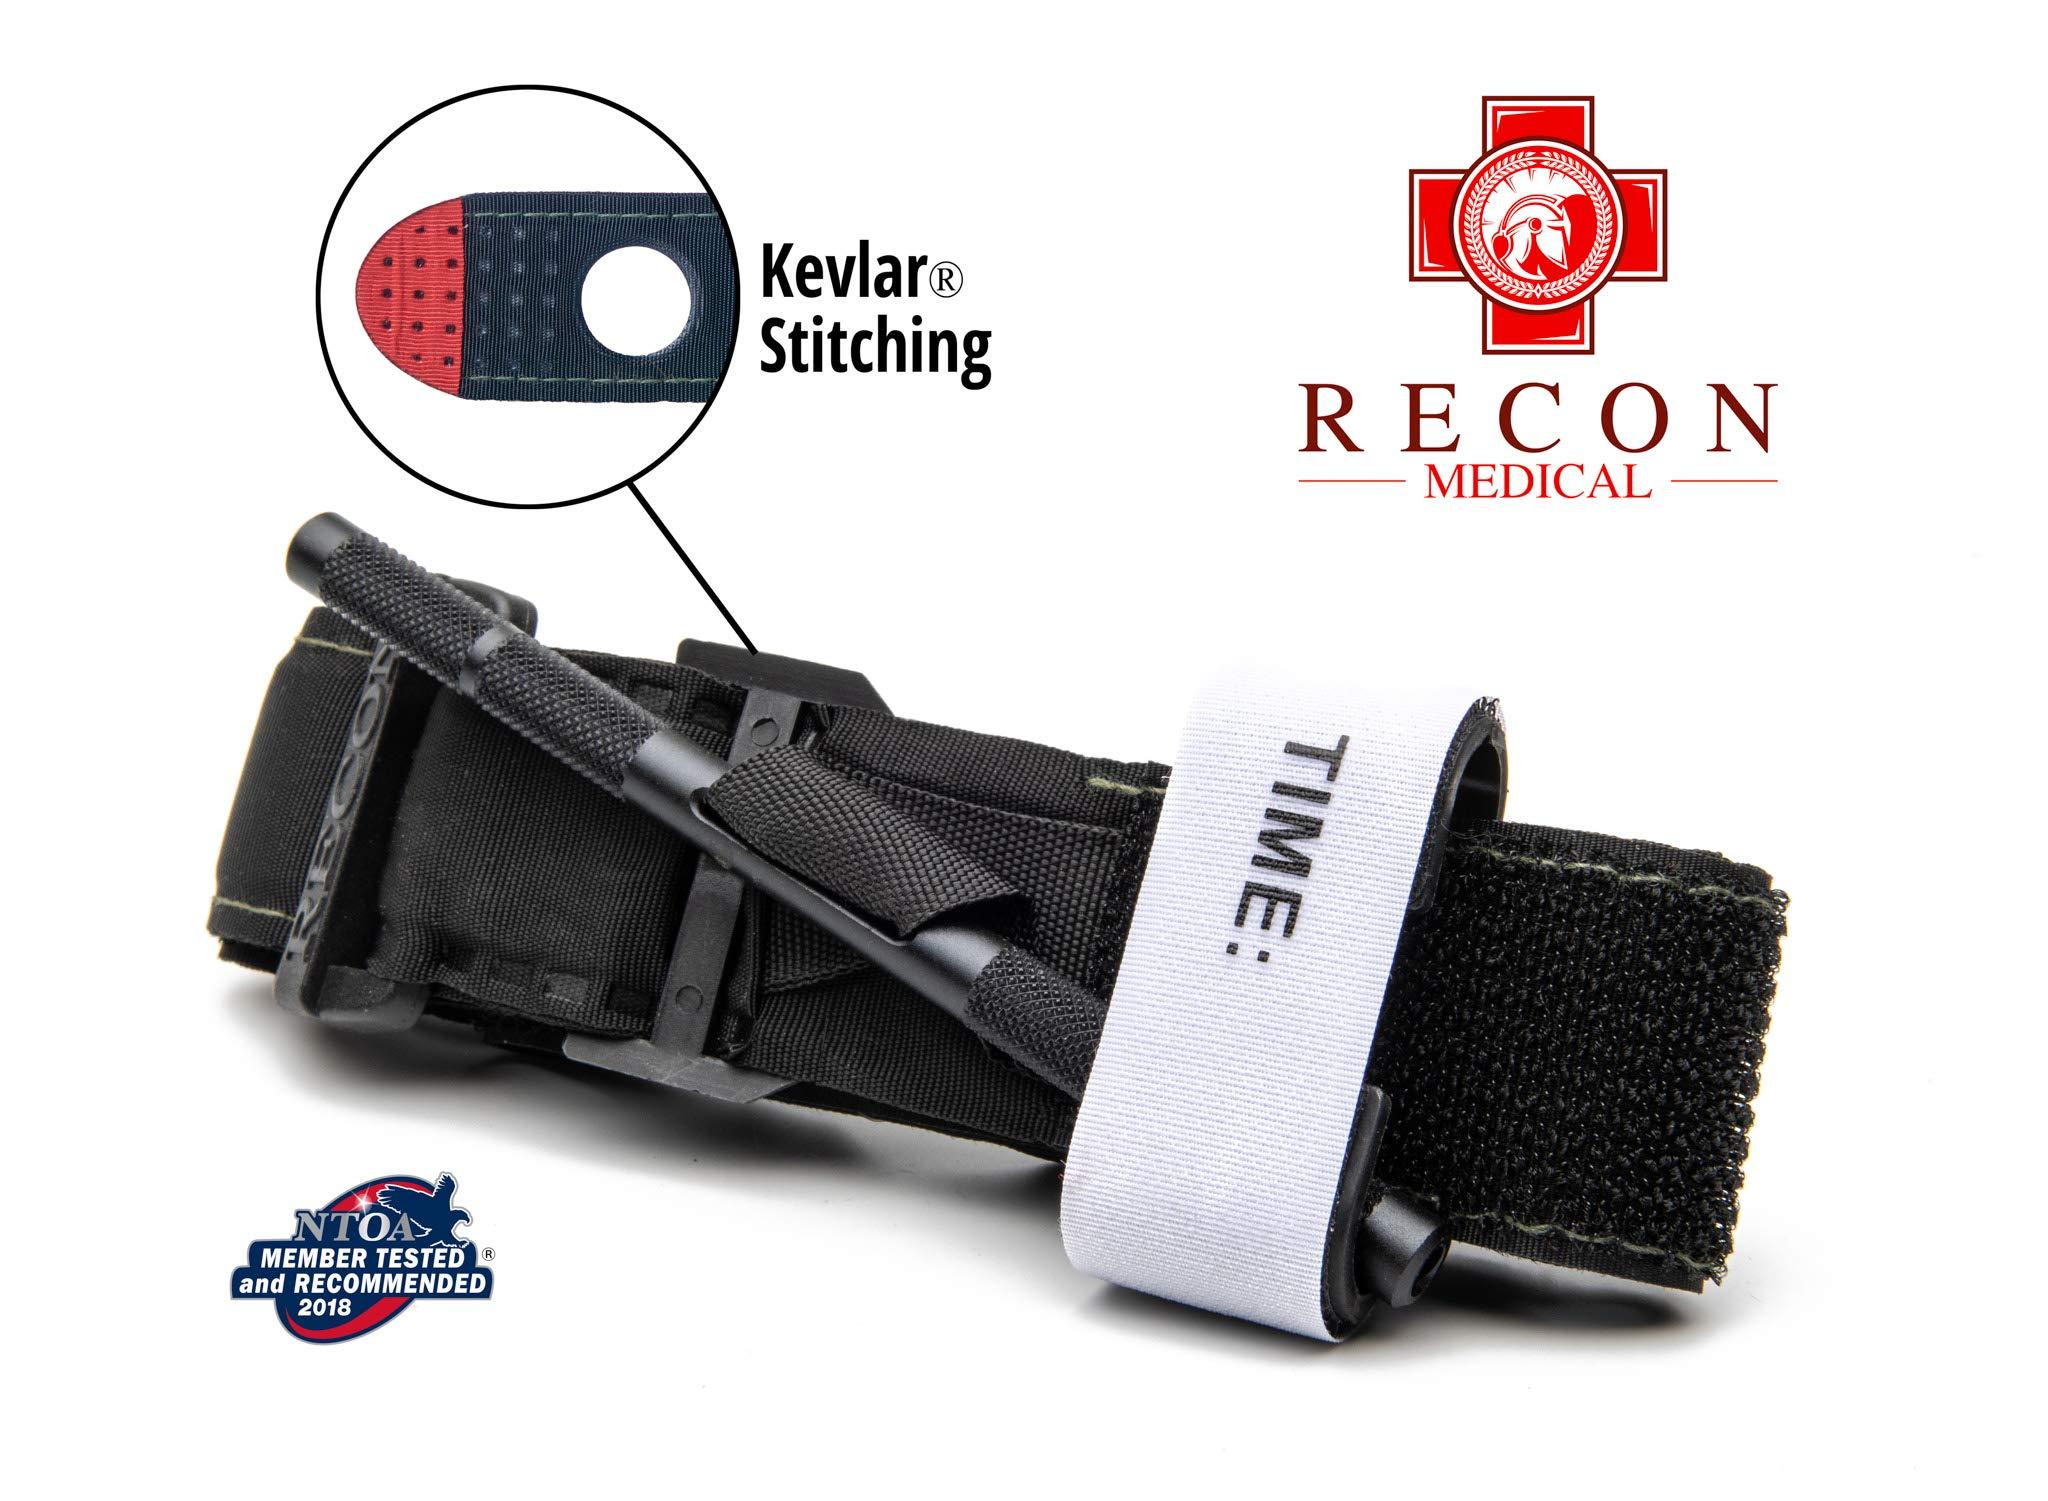 Recon Medical BLK-1PAK-FBA Tourniquet - (Black) Gen 3 Mil-Spec Kevlar Metal Windlass Aluminum First Aid Tactical Swat Medic Pre-Hospital Life Saving Hemorrhage Control Registration Card 1 Pack